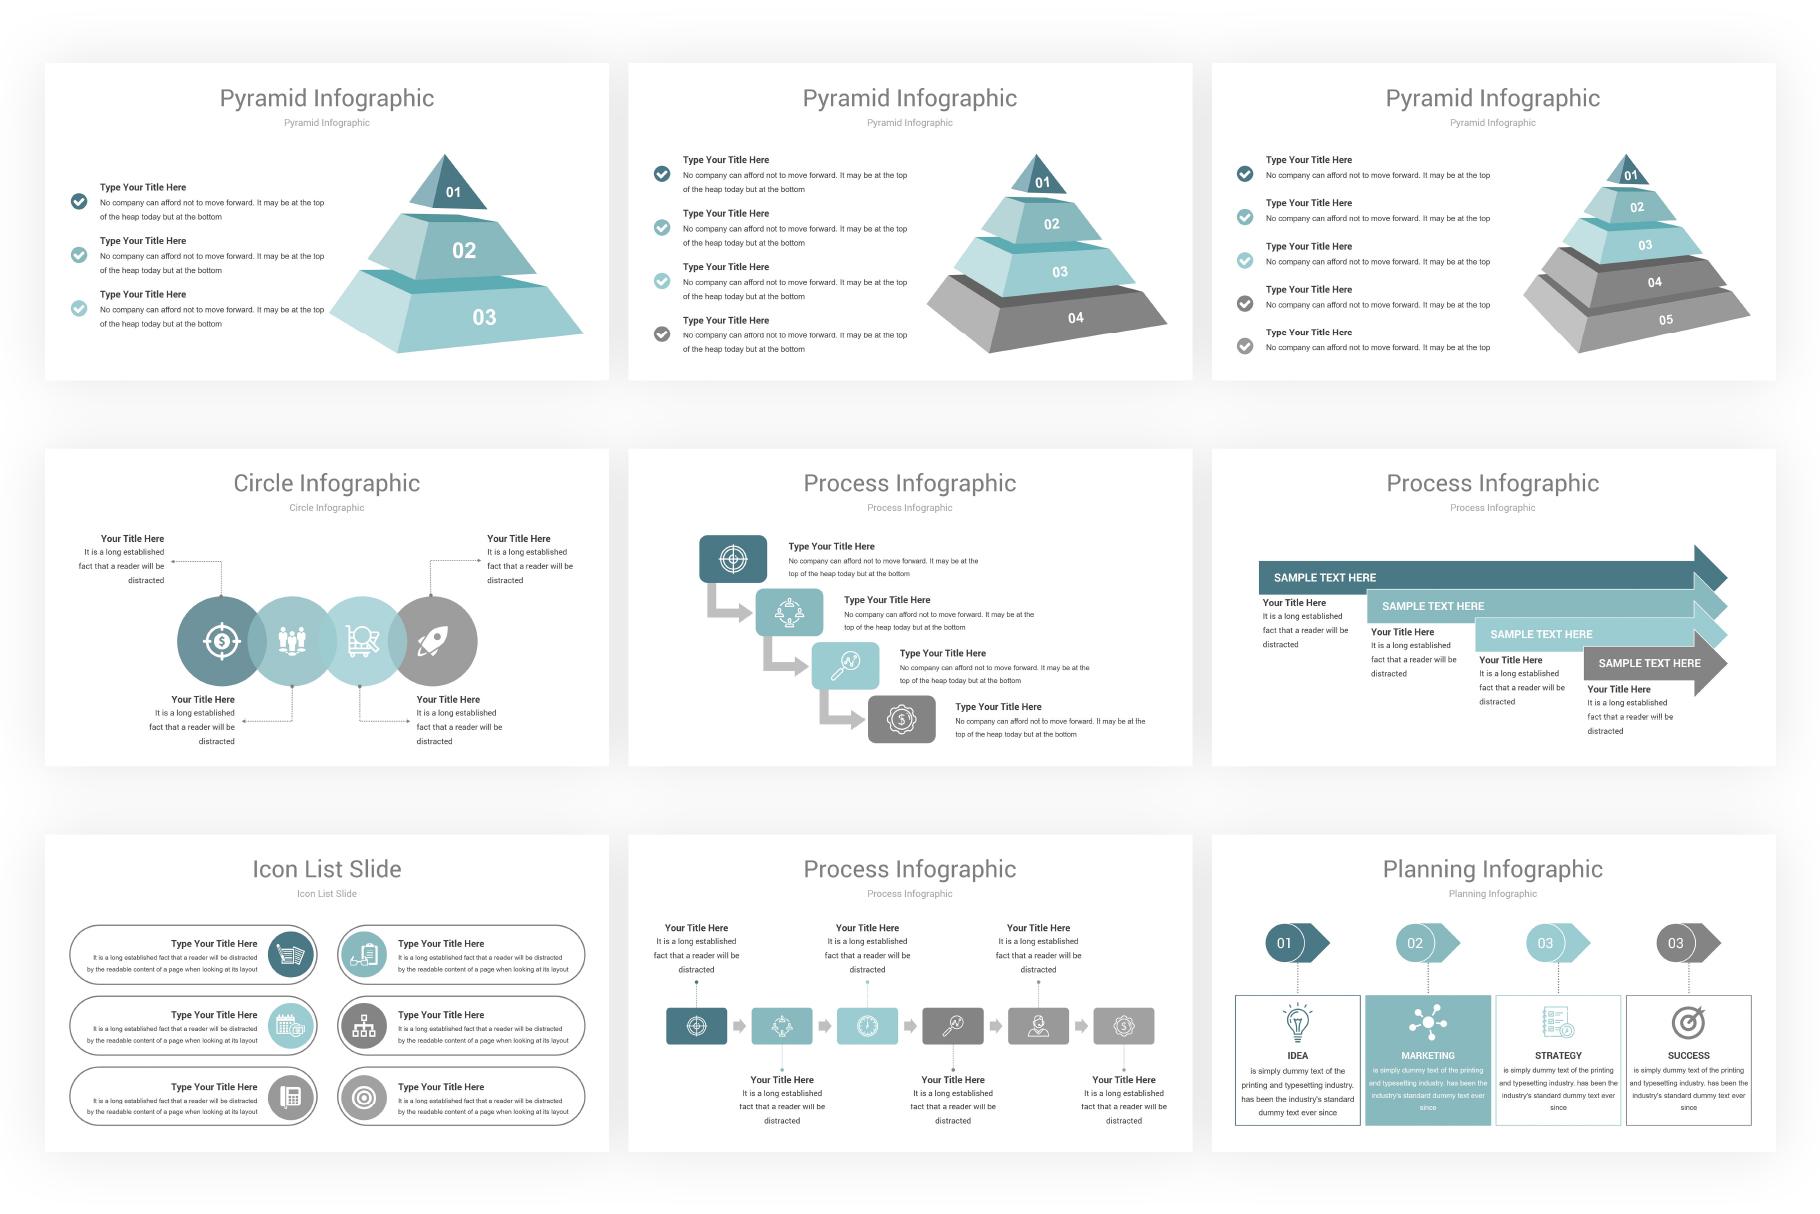 Marketing Plan PowerPoint Presentation Template example image 23